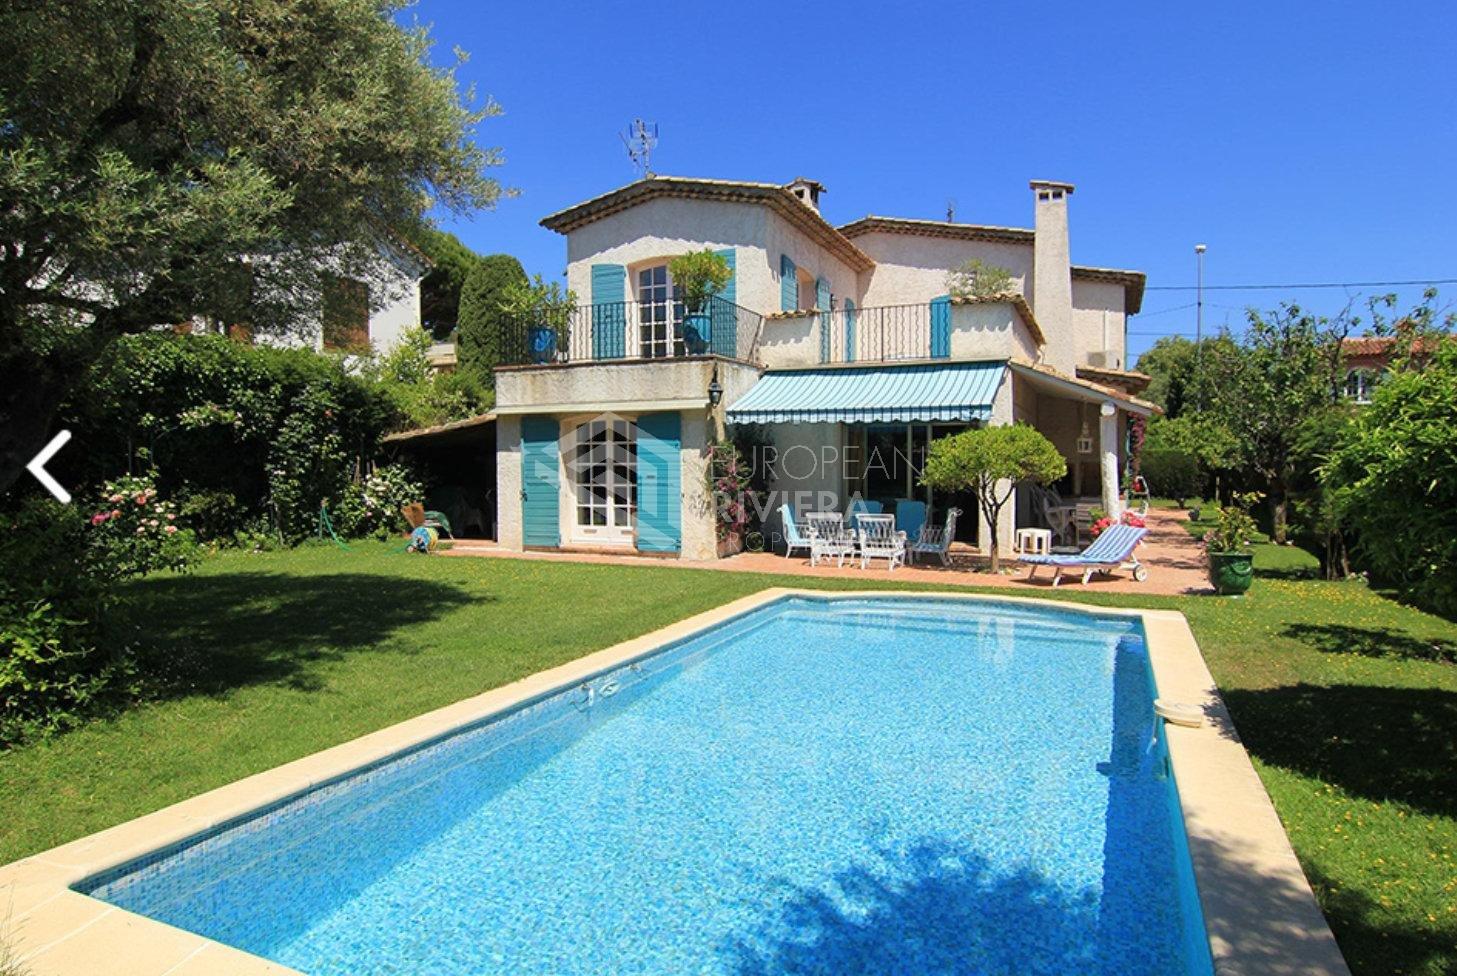 Antibes - Cap d'Antibes - Villa 6 pièces avec piscine et jardin 750m²